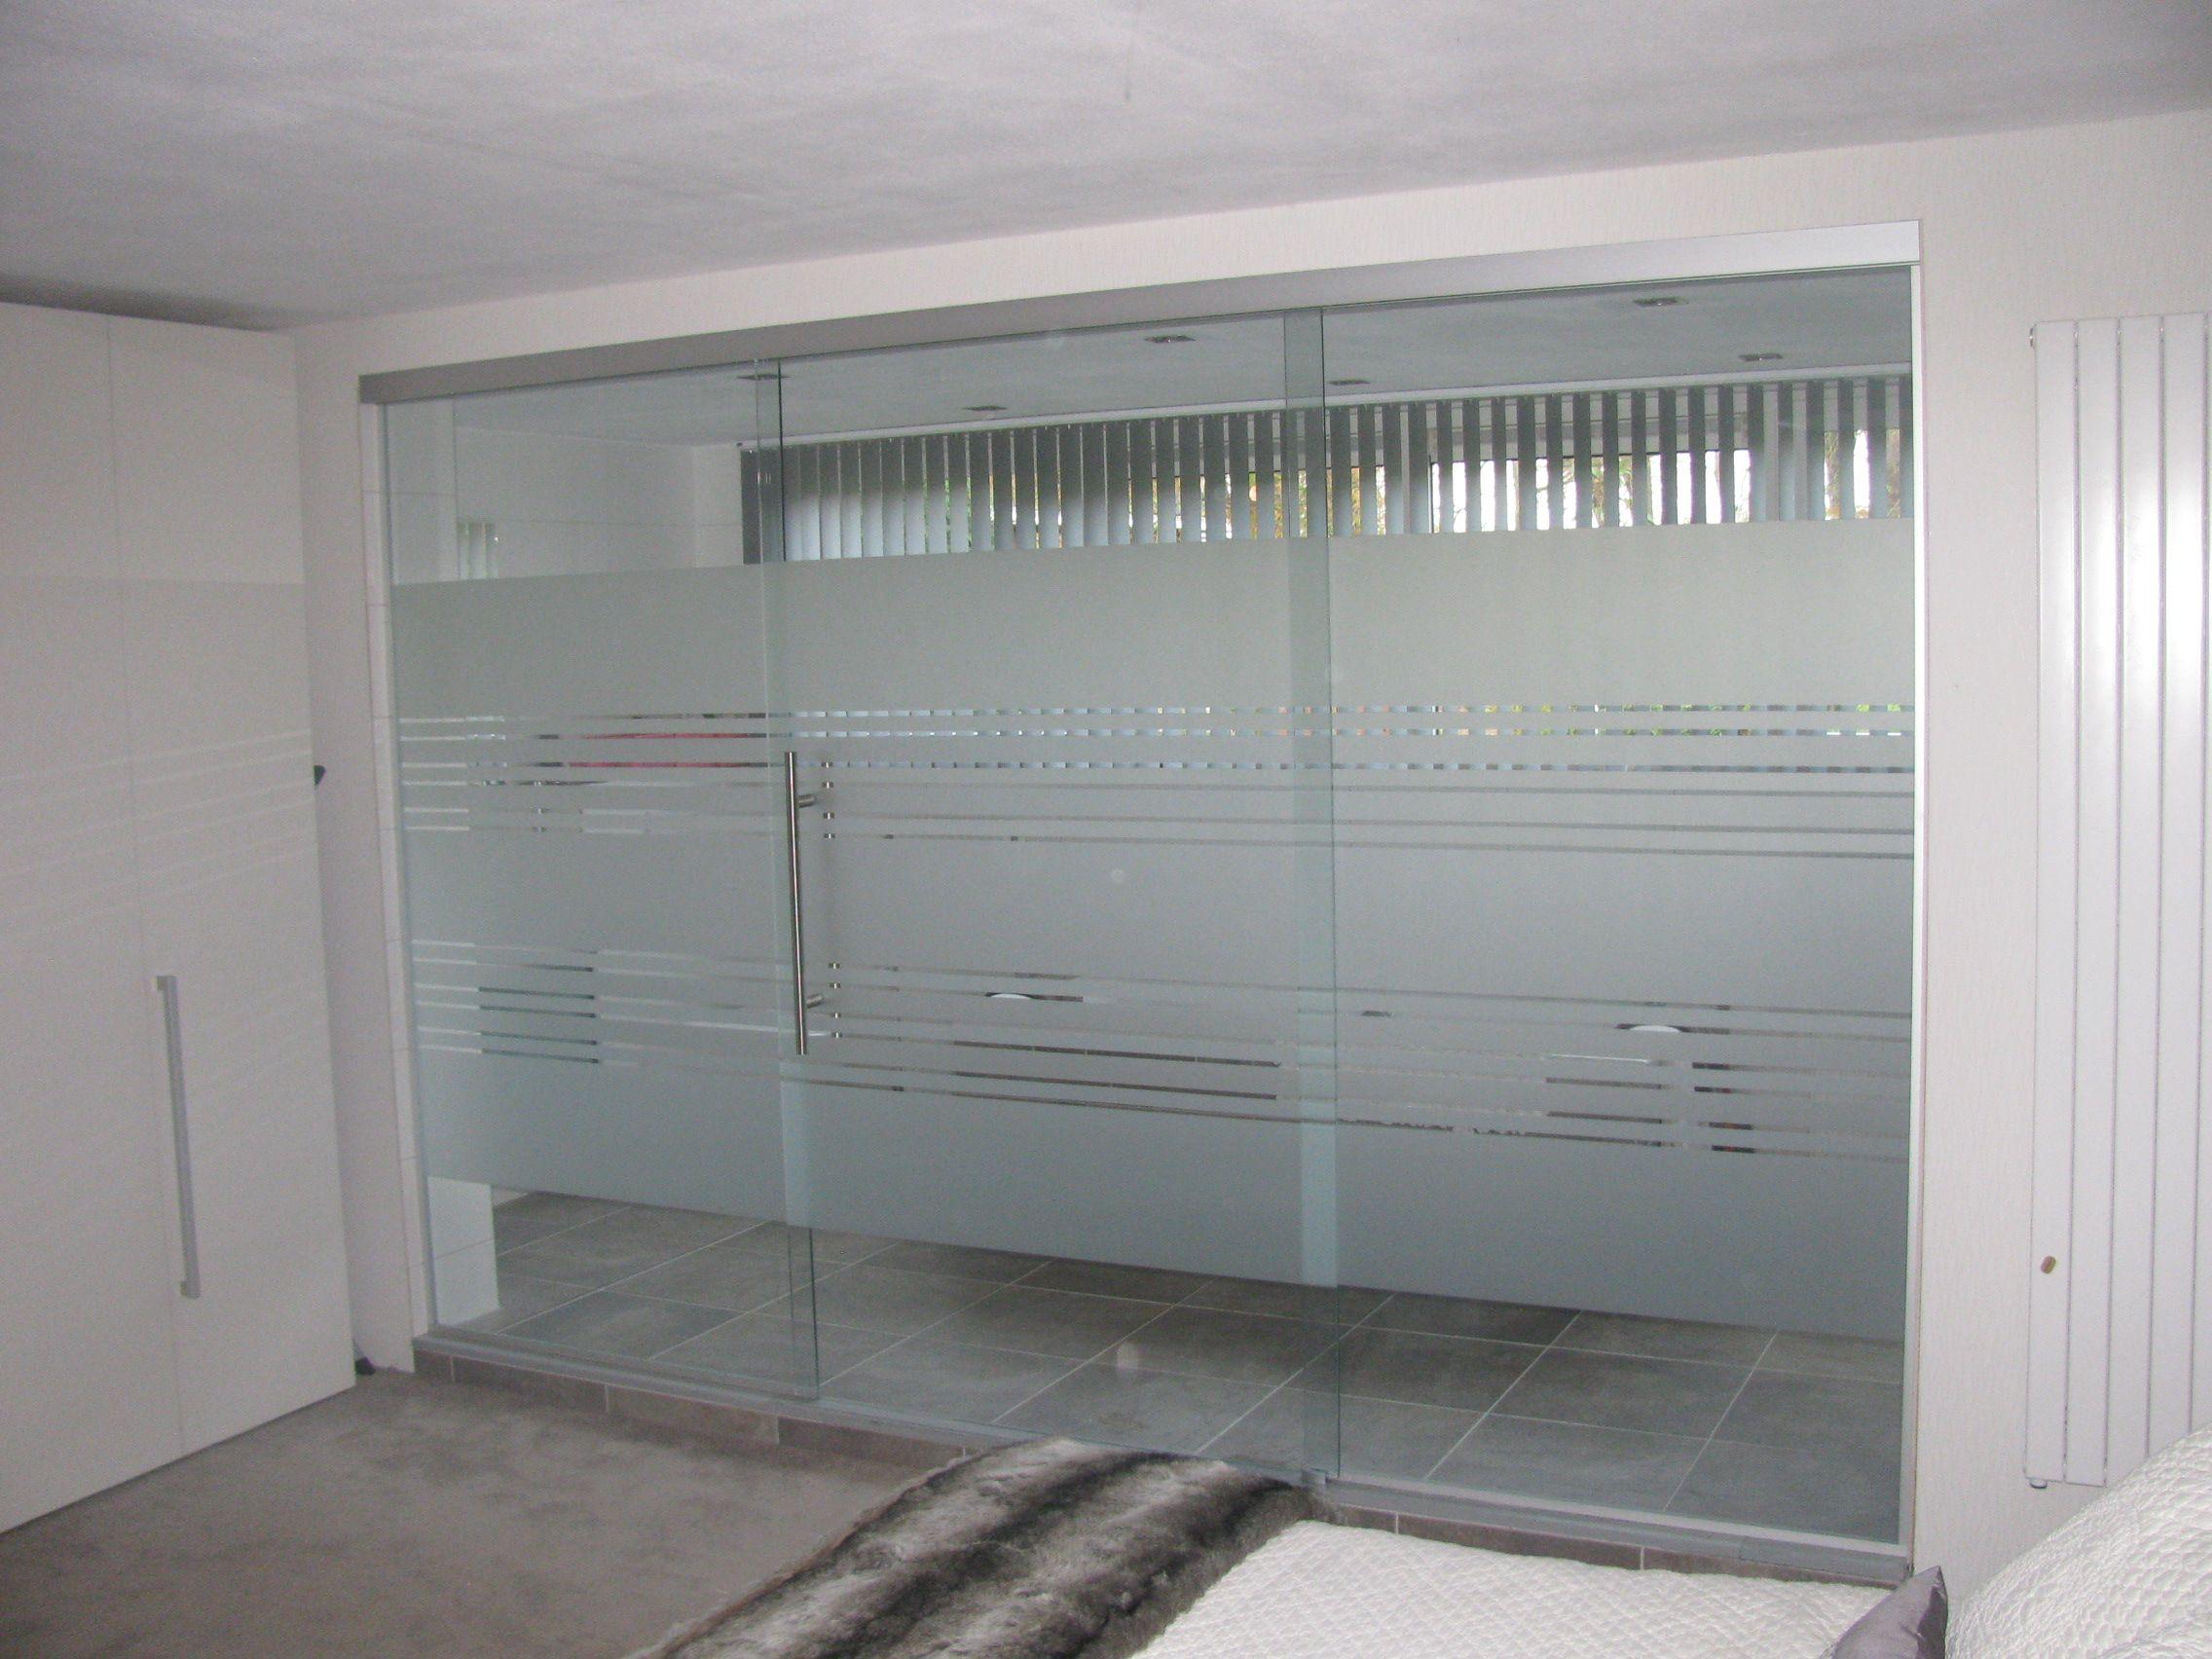 Raamfolie Voor Badkamer : Avery dusted glass streepjes folie in een badkamer. decoratieve